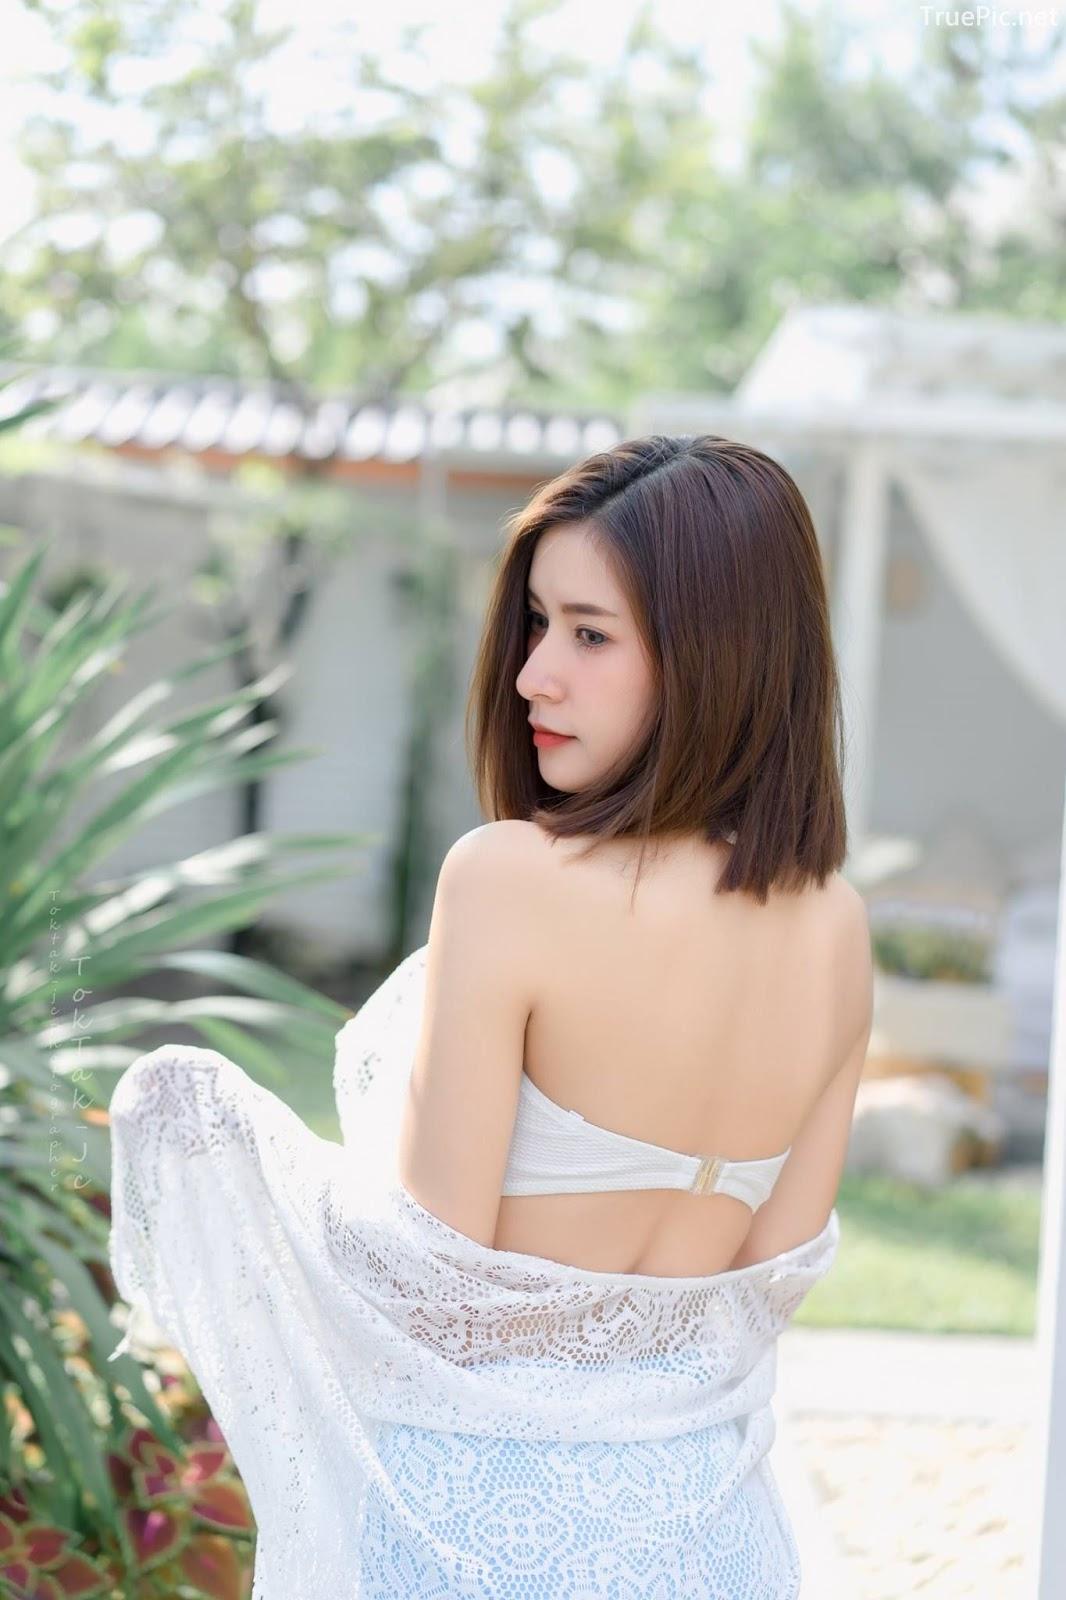 Thailand hot model MIldd Thanyarath Sriudomloert - Sexy 2 Piece Swimsuits - Picture 2